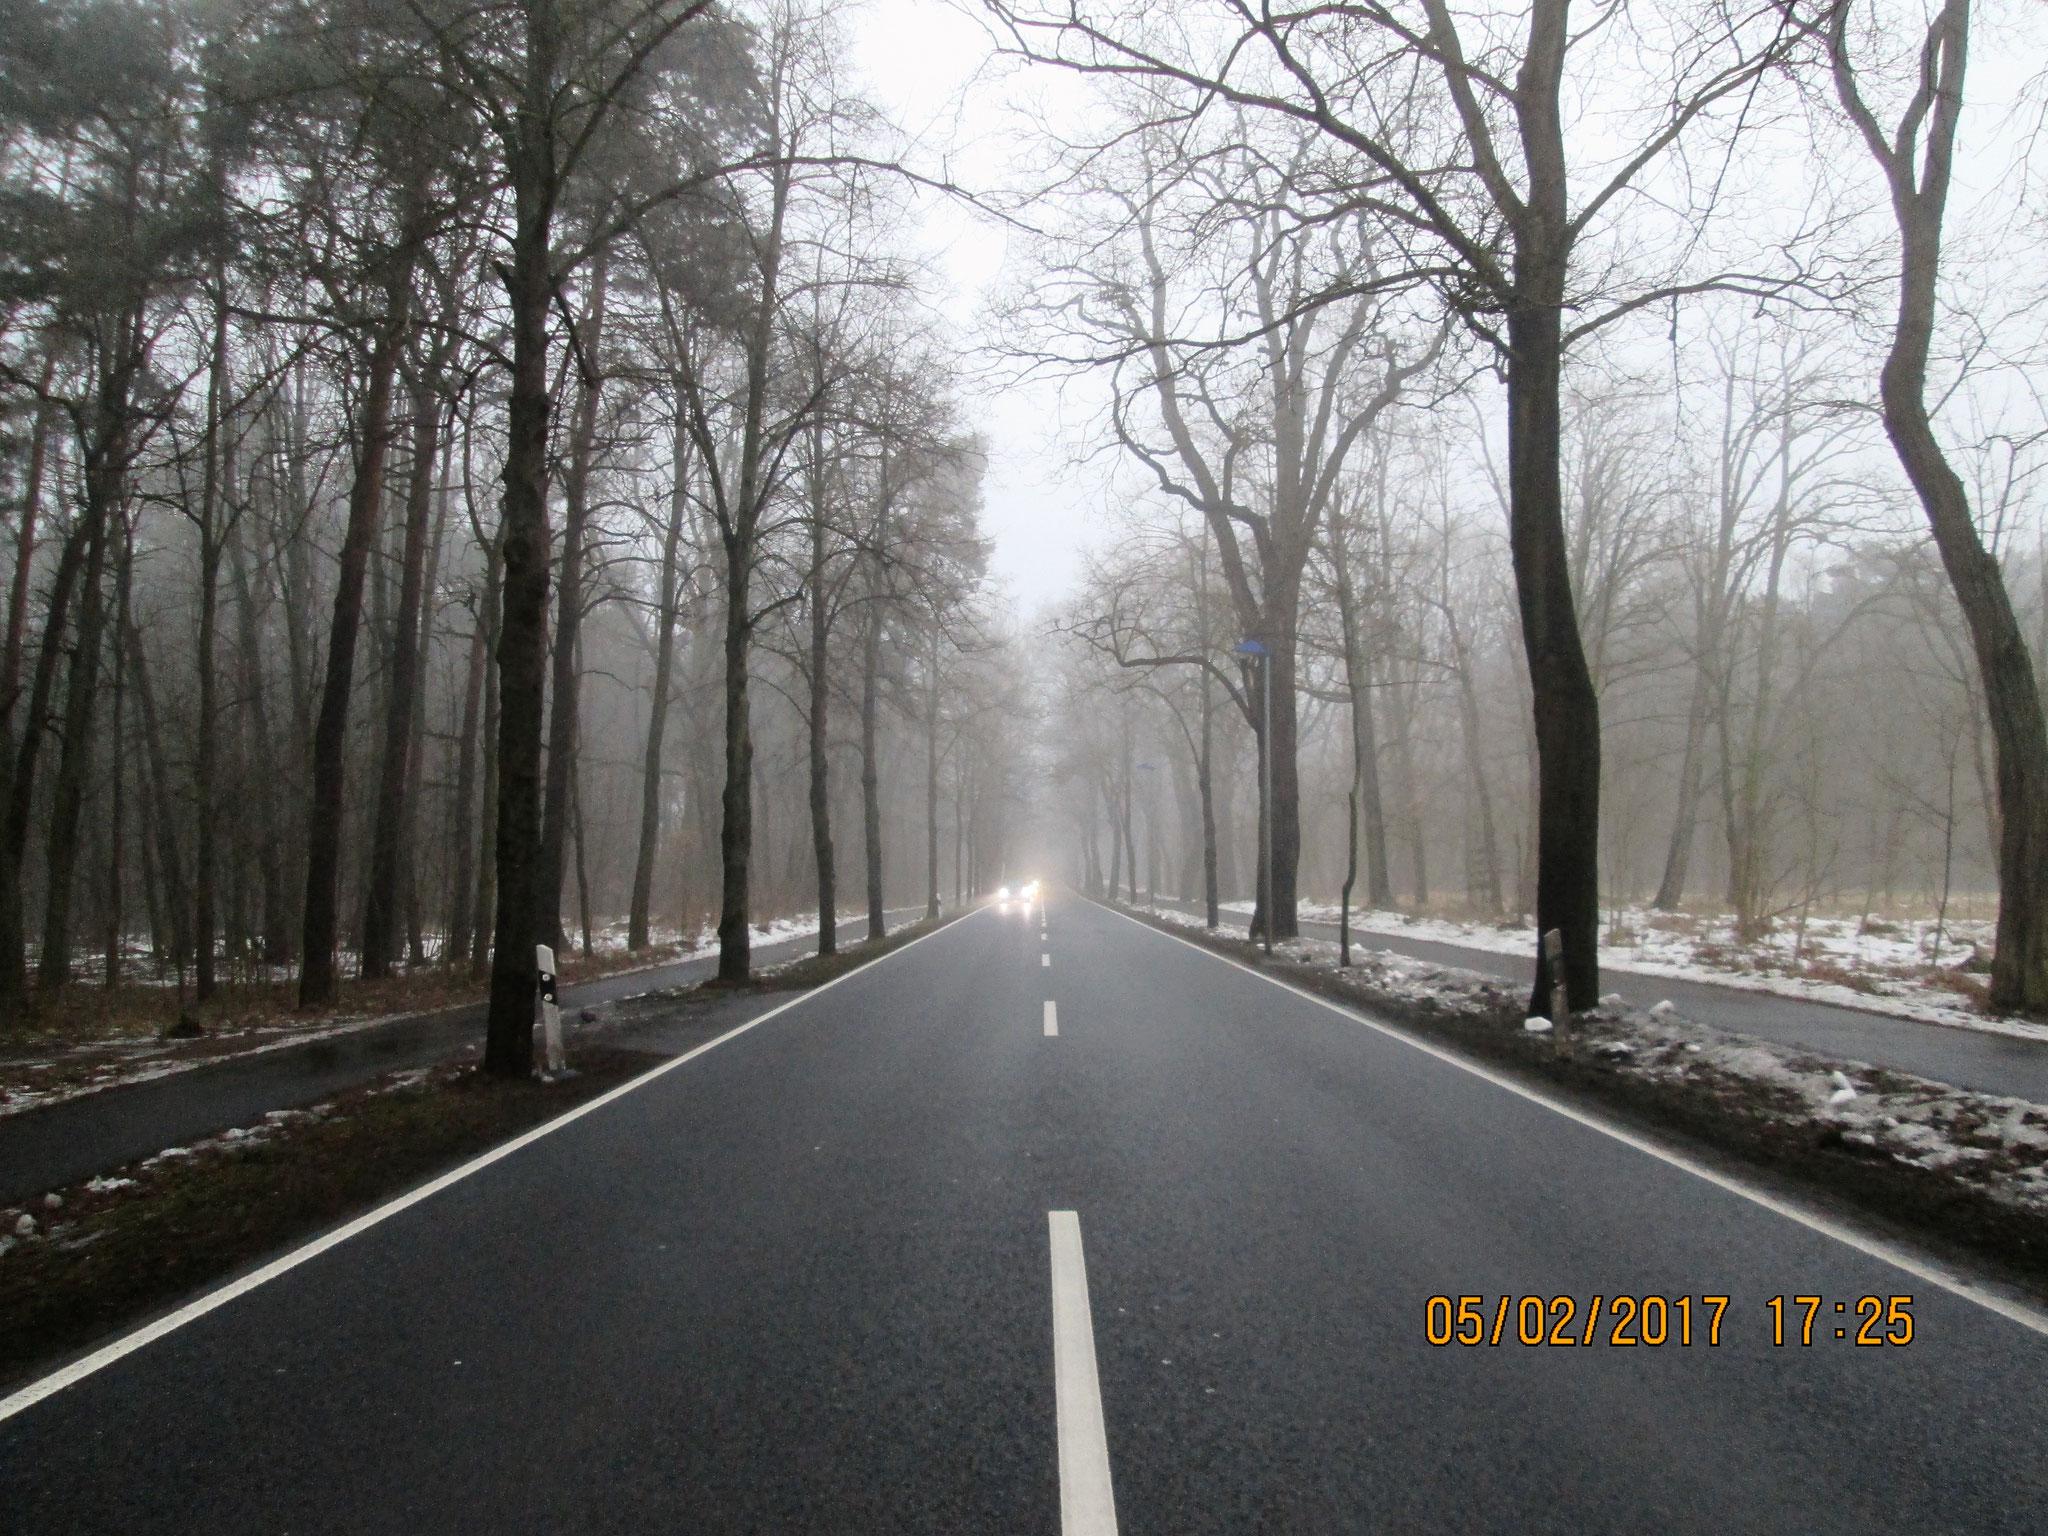 Weg zum Bahnhof, 4 km Straße